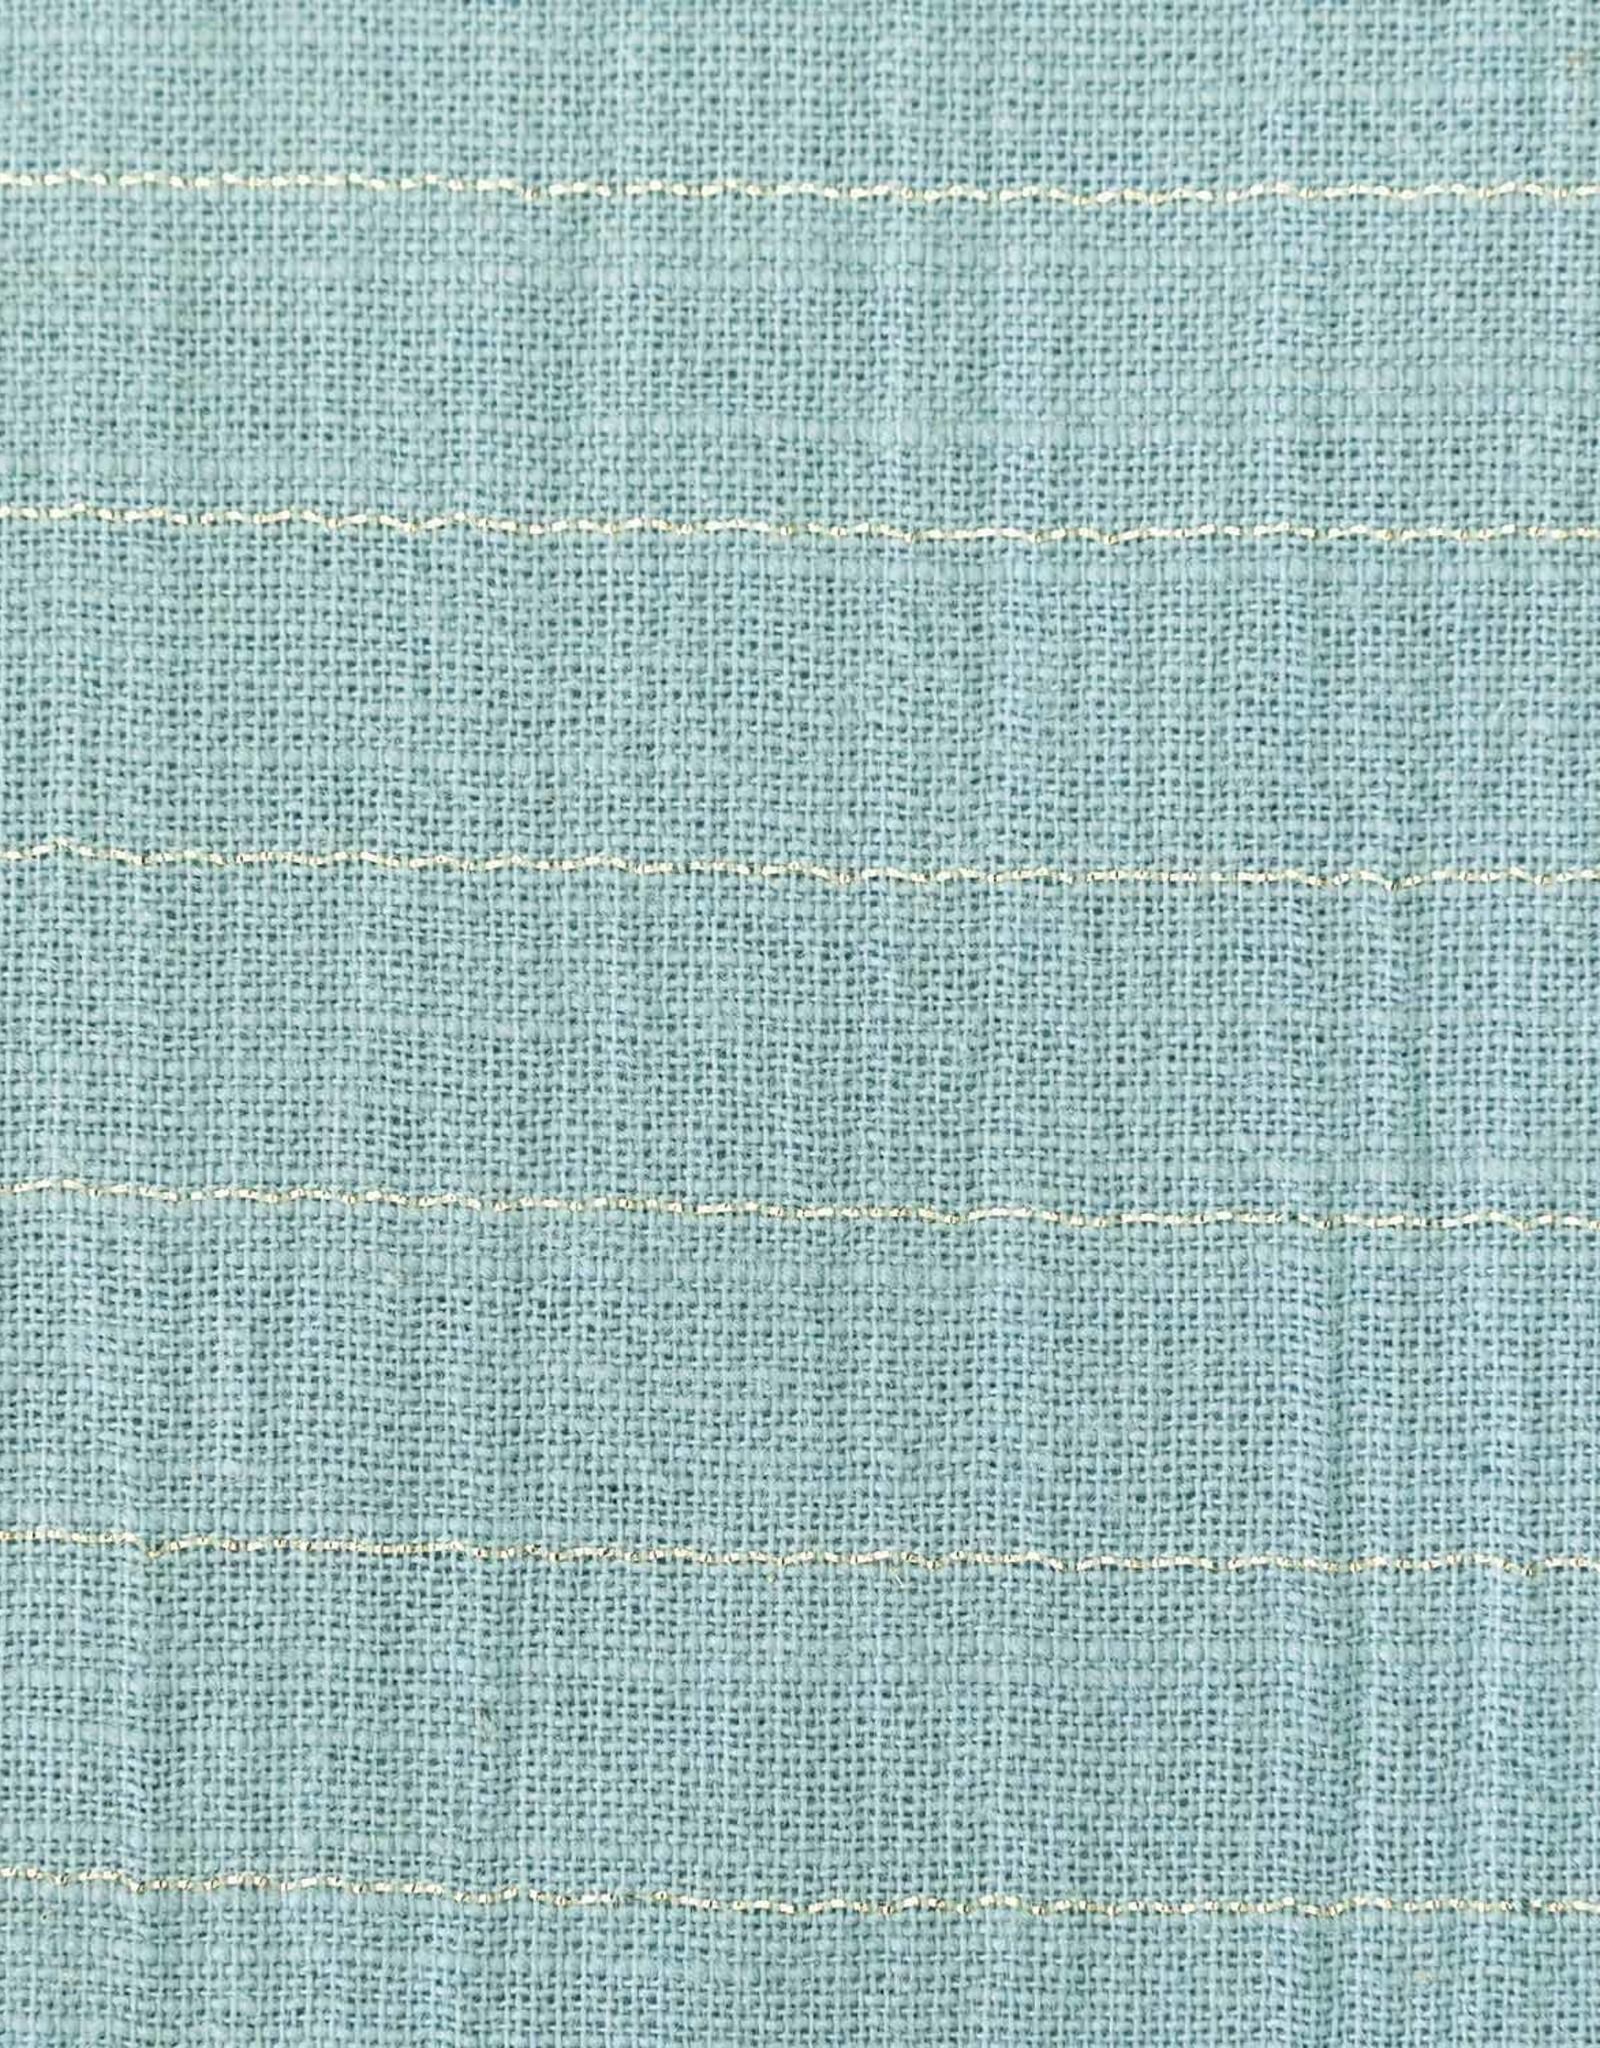 Katia Fabrics Sari Katoen - Aqua Gold